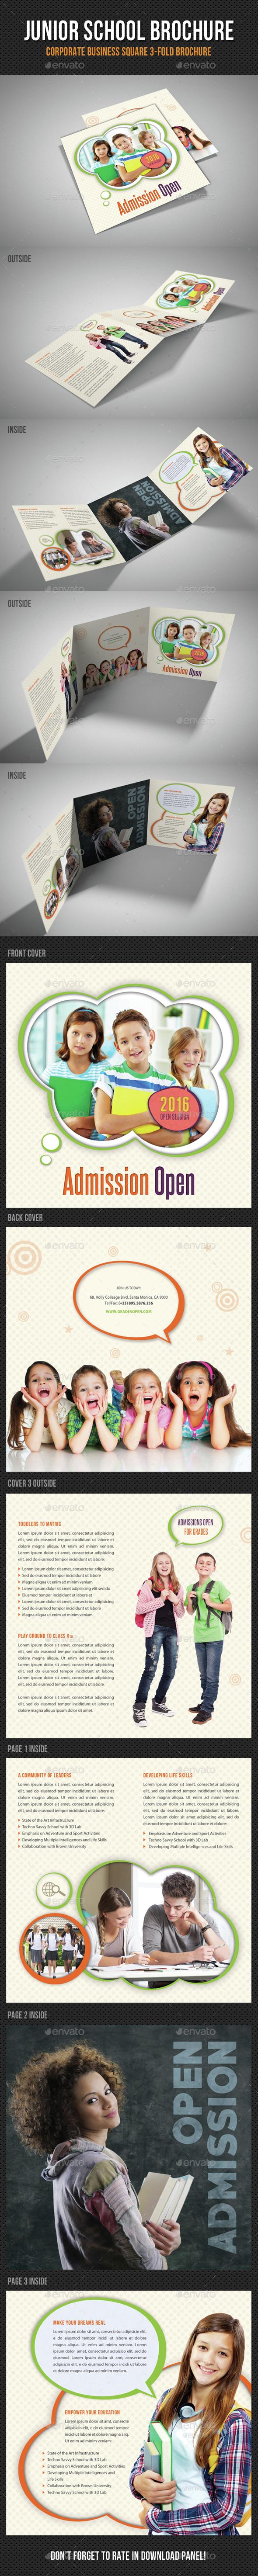 Junior School Square 3-Fold Brochure V03 - Brochures Print Templates